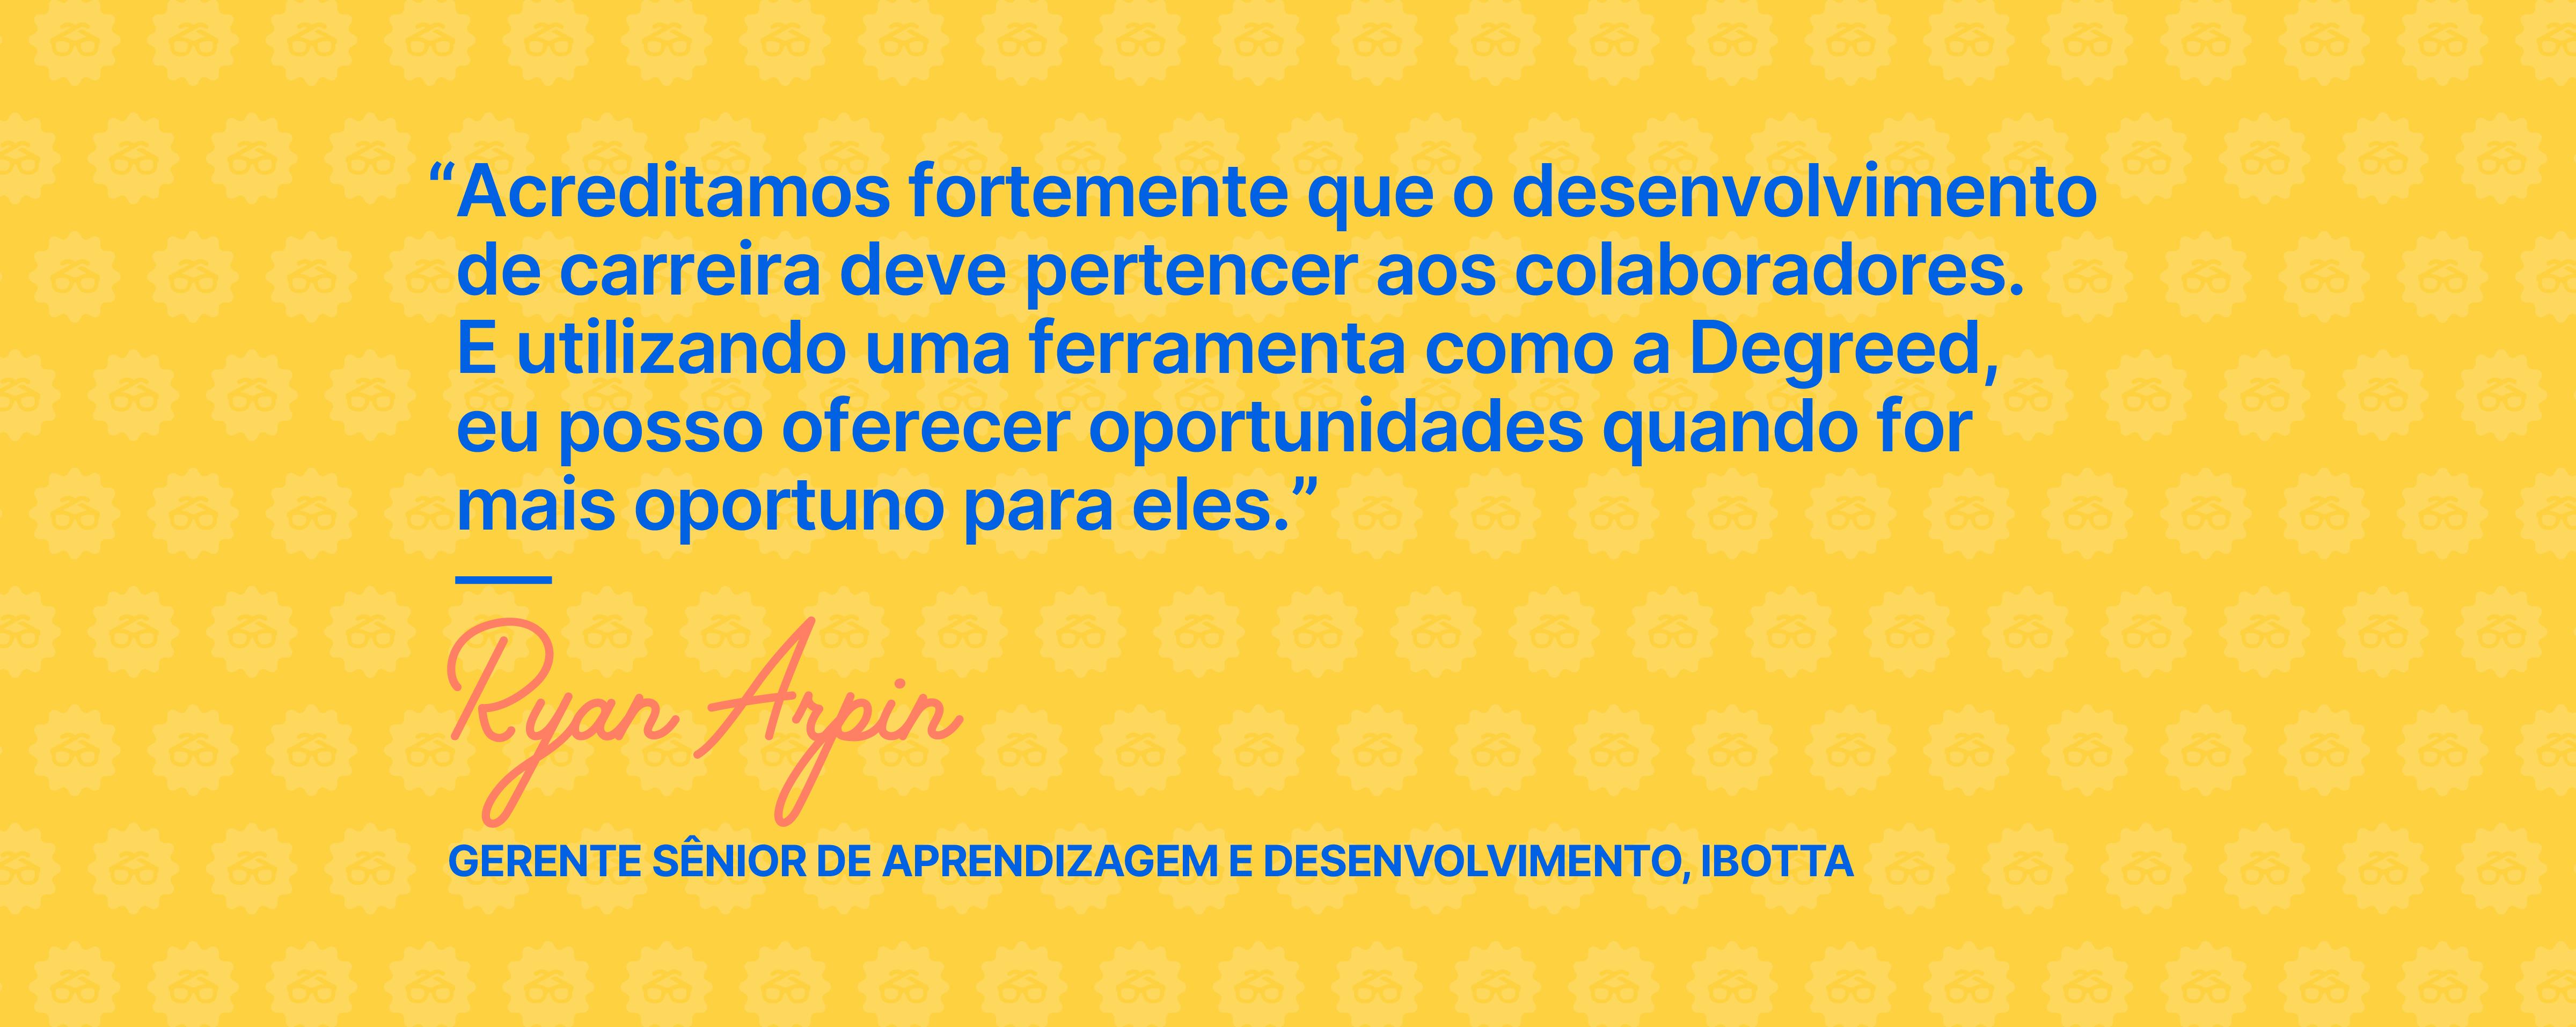 LENS_LITE_2021_Hubspot-Quote-Ryan-Arpin-Portuguese@2x